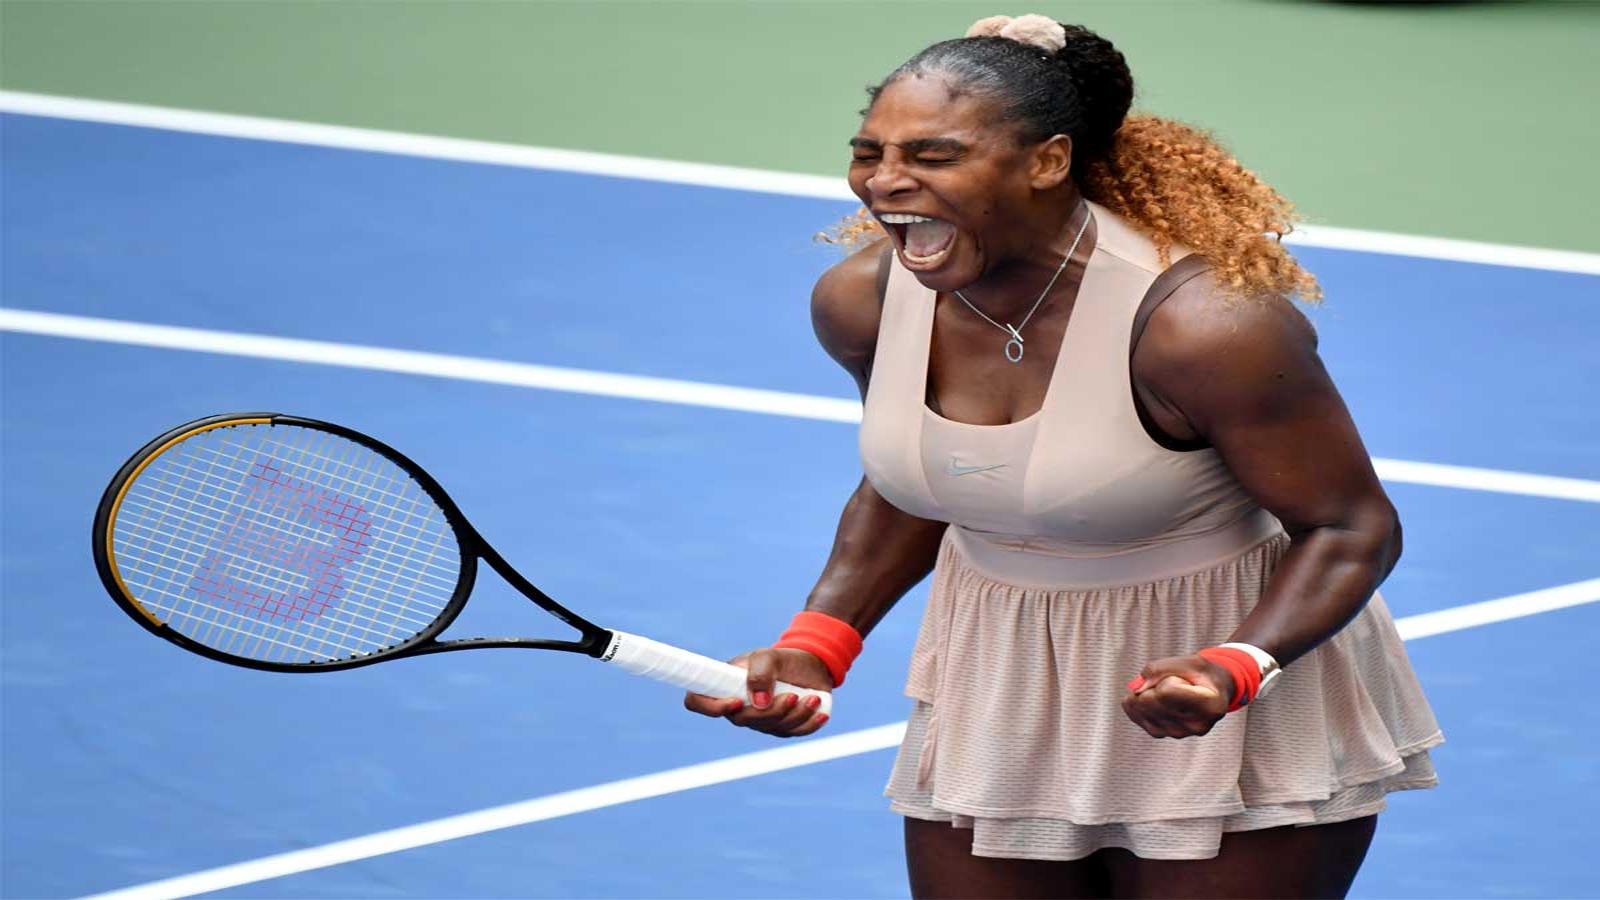 us-open-serena-fights-her-way-into-quarter-finals-as-thiem-sails-through